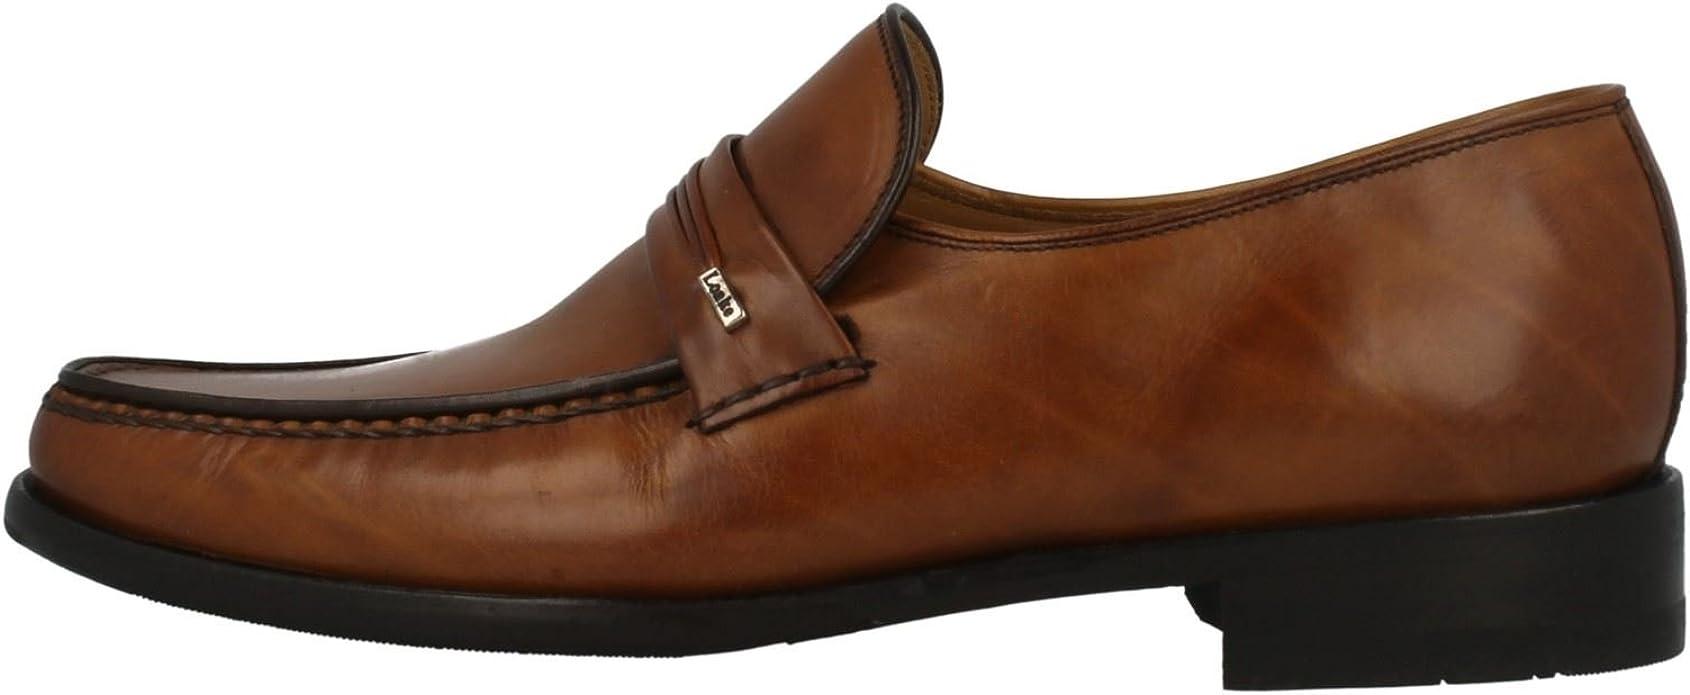 Mens Loake Shoes Palermo2